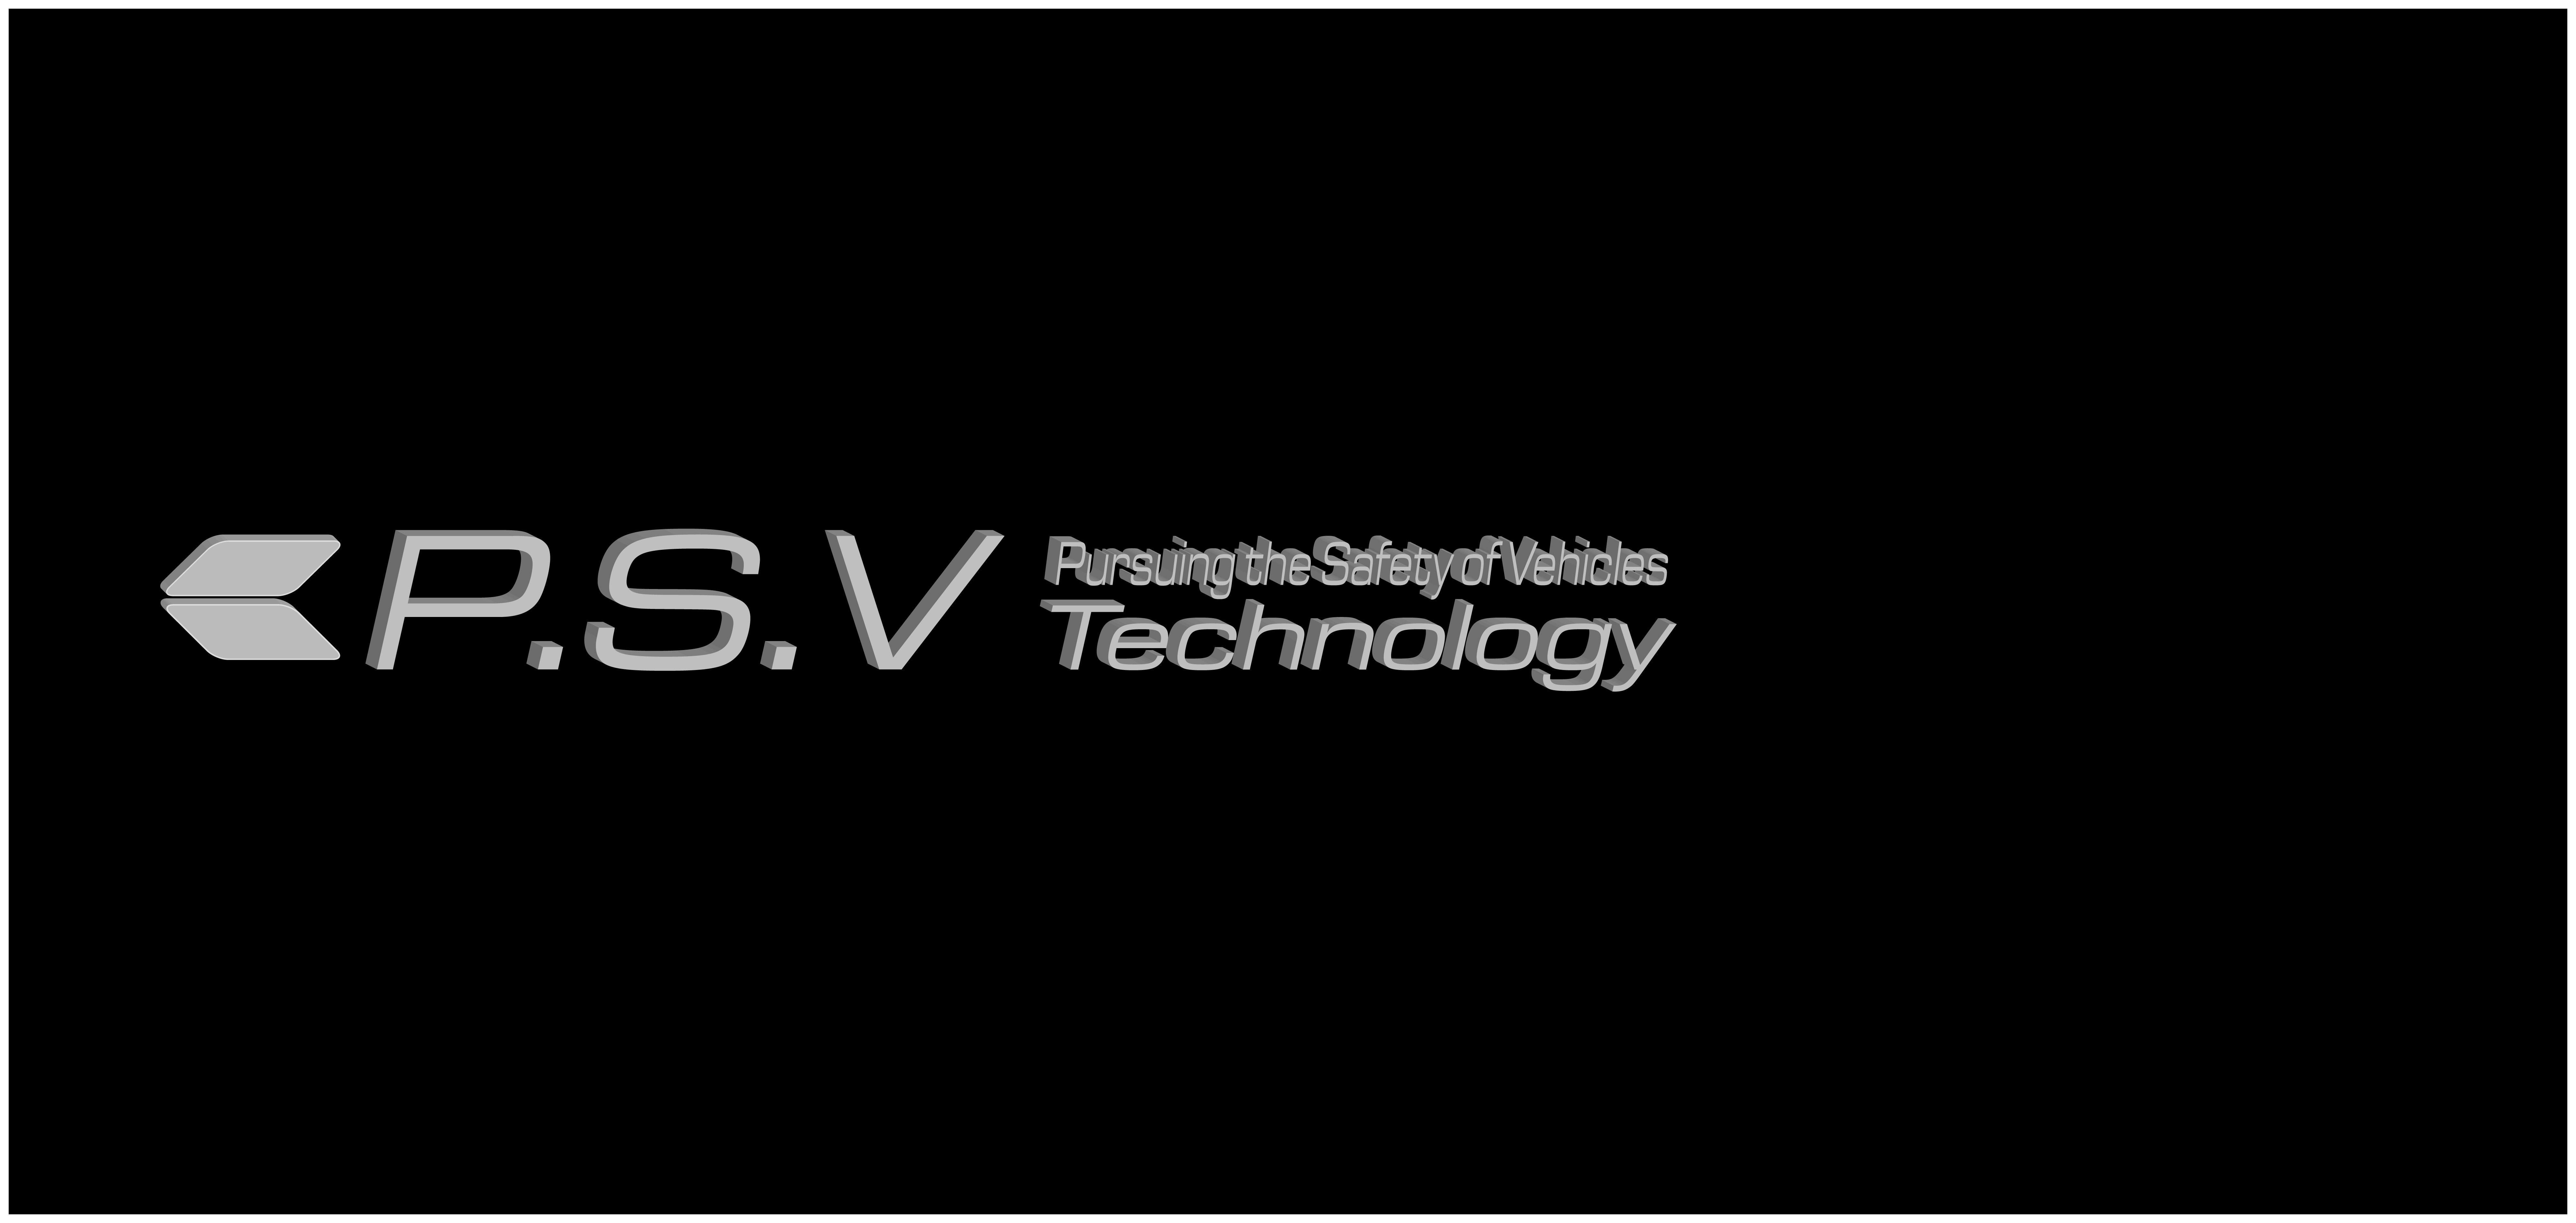 P.S.V Technology (ピー・エス・ブイ テクノロジー)